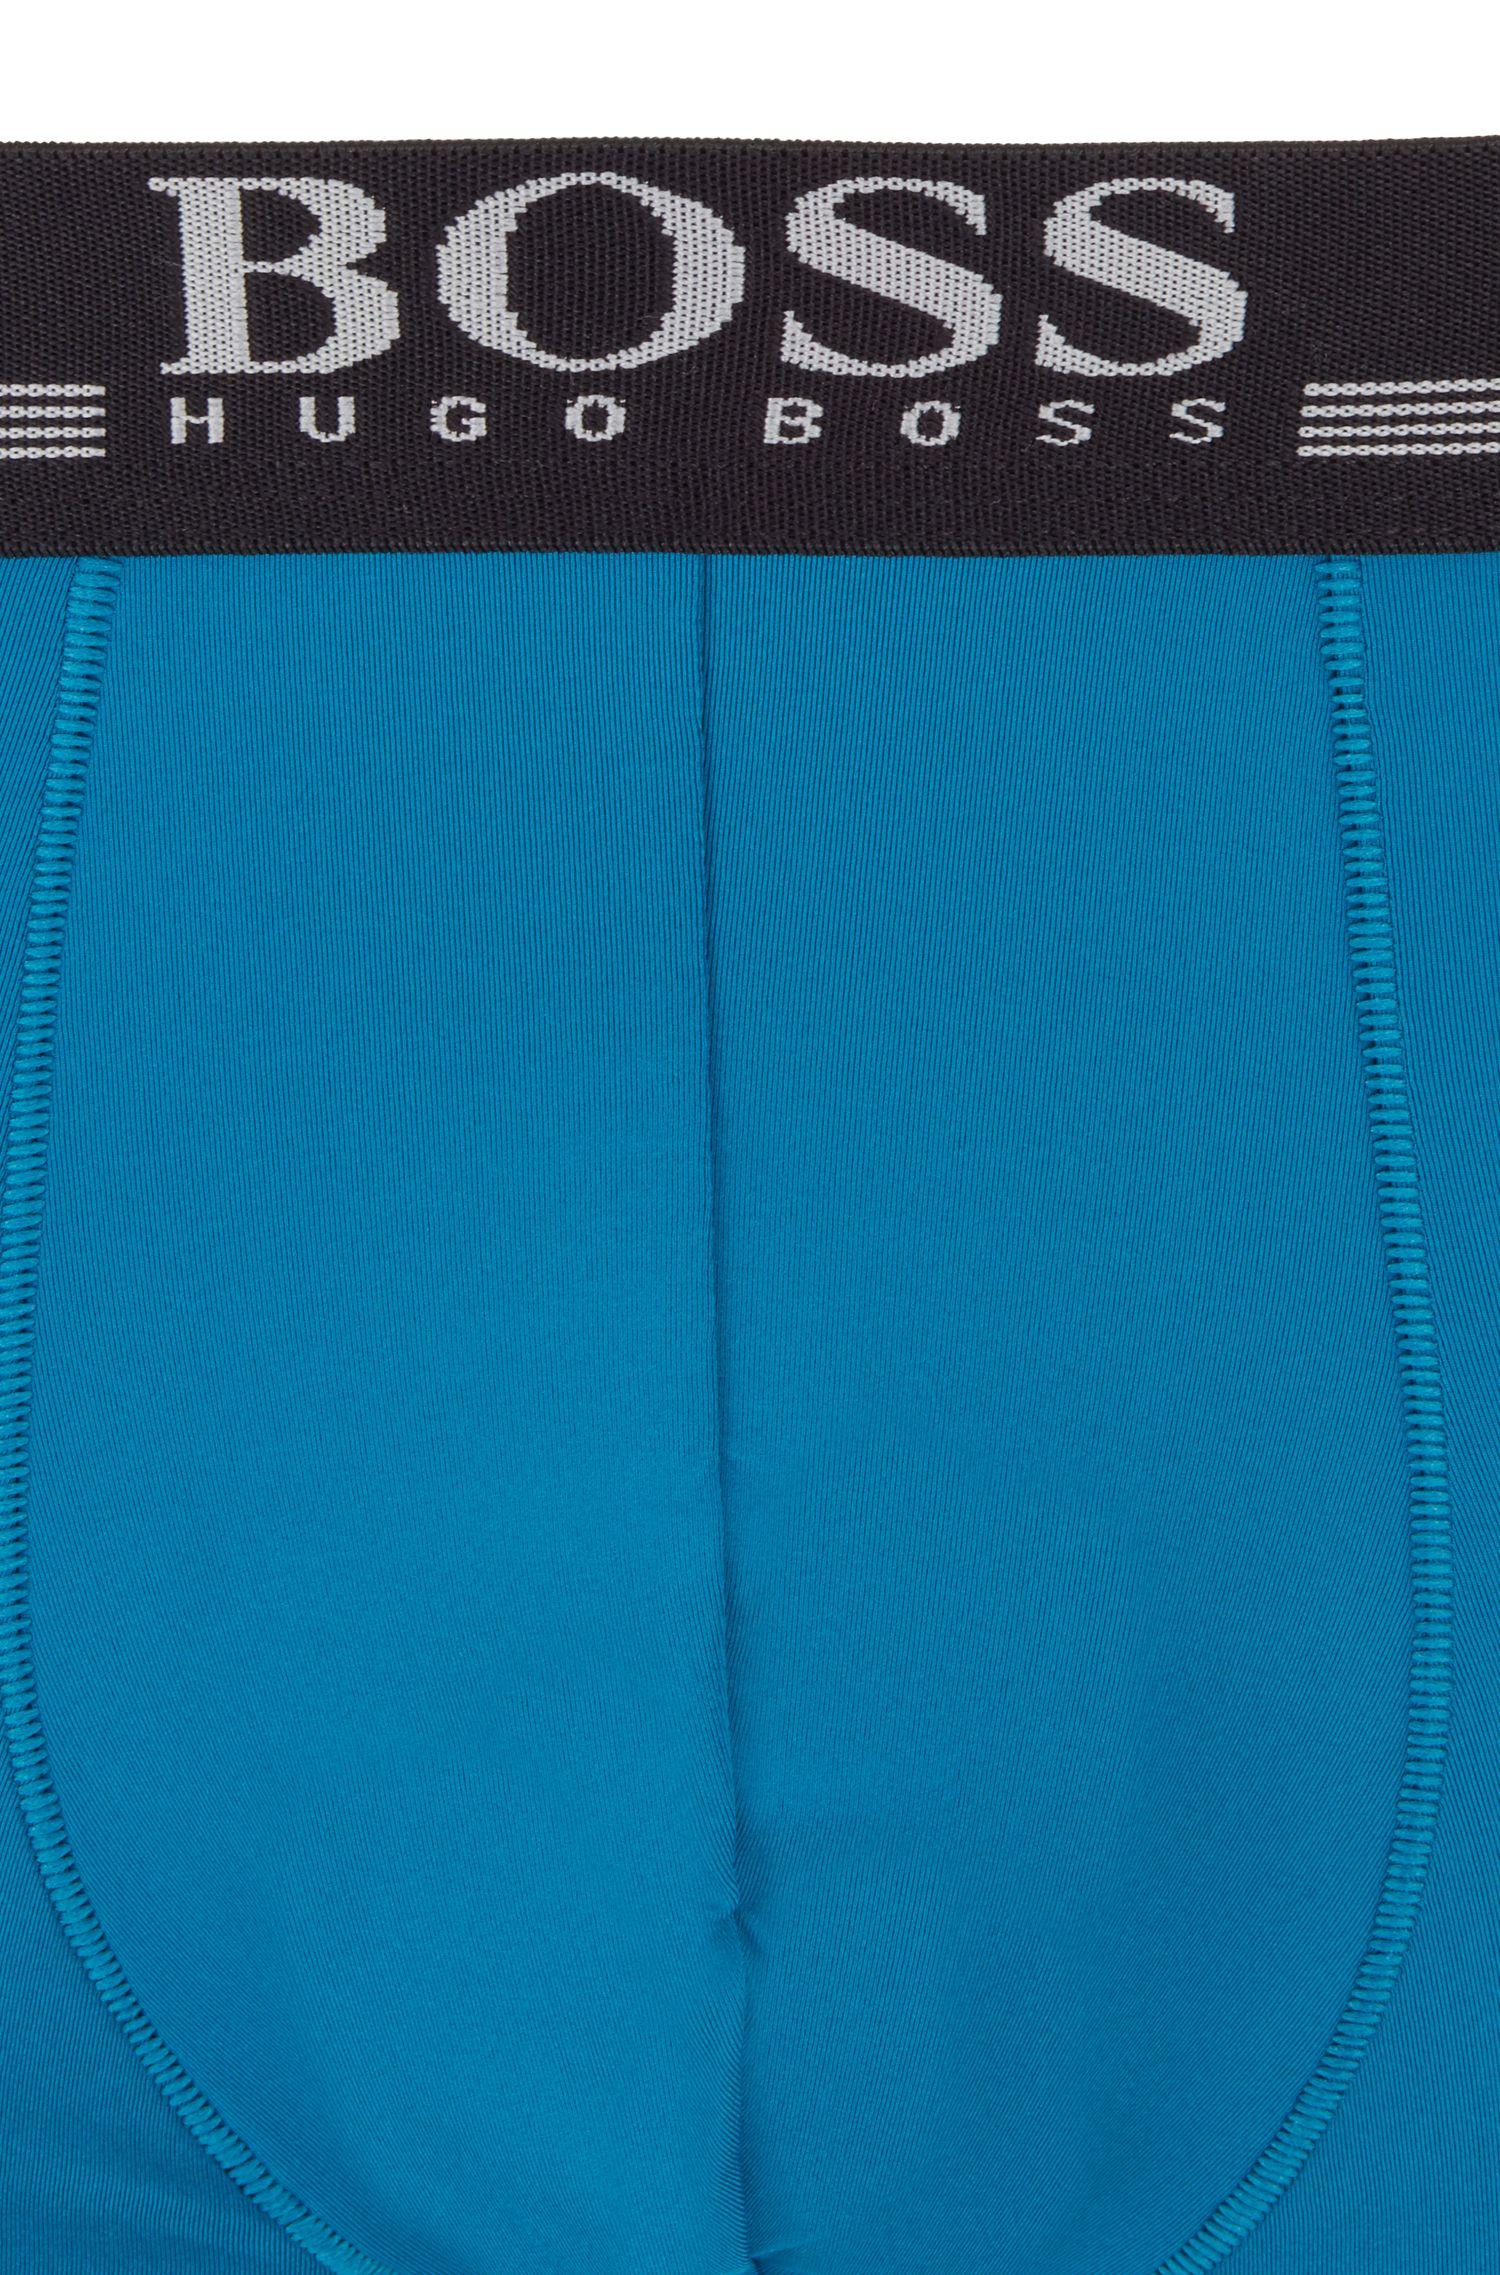 Sneldrogende boxerslip van microvezel met vierzijdige stretch, Turkoois